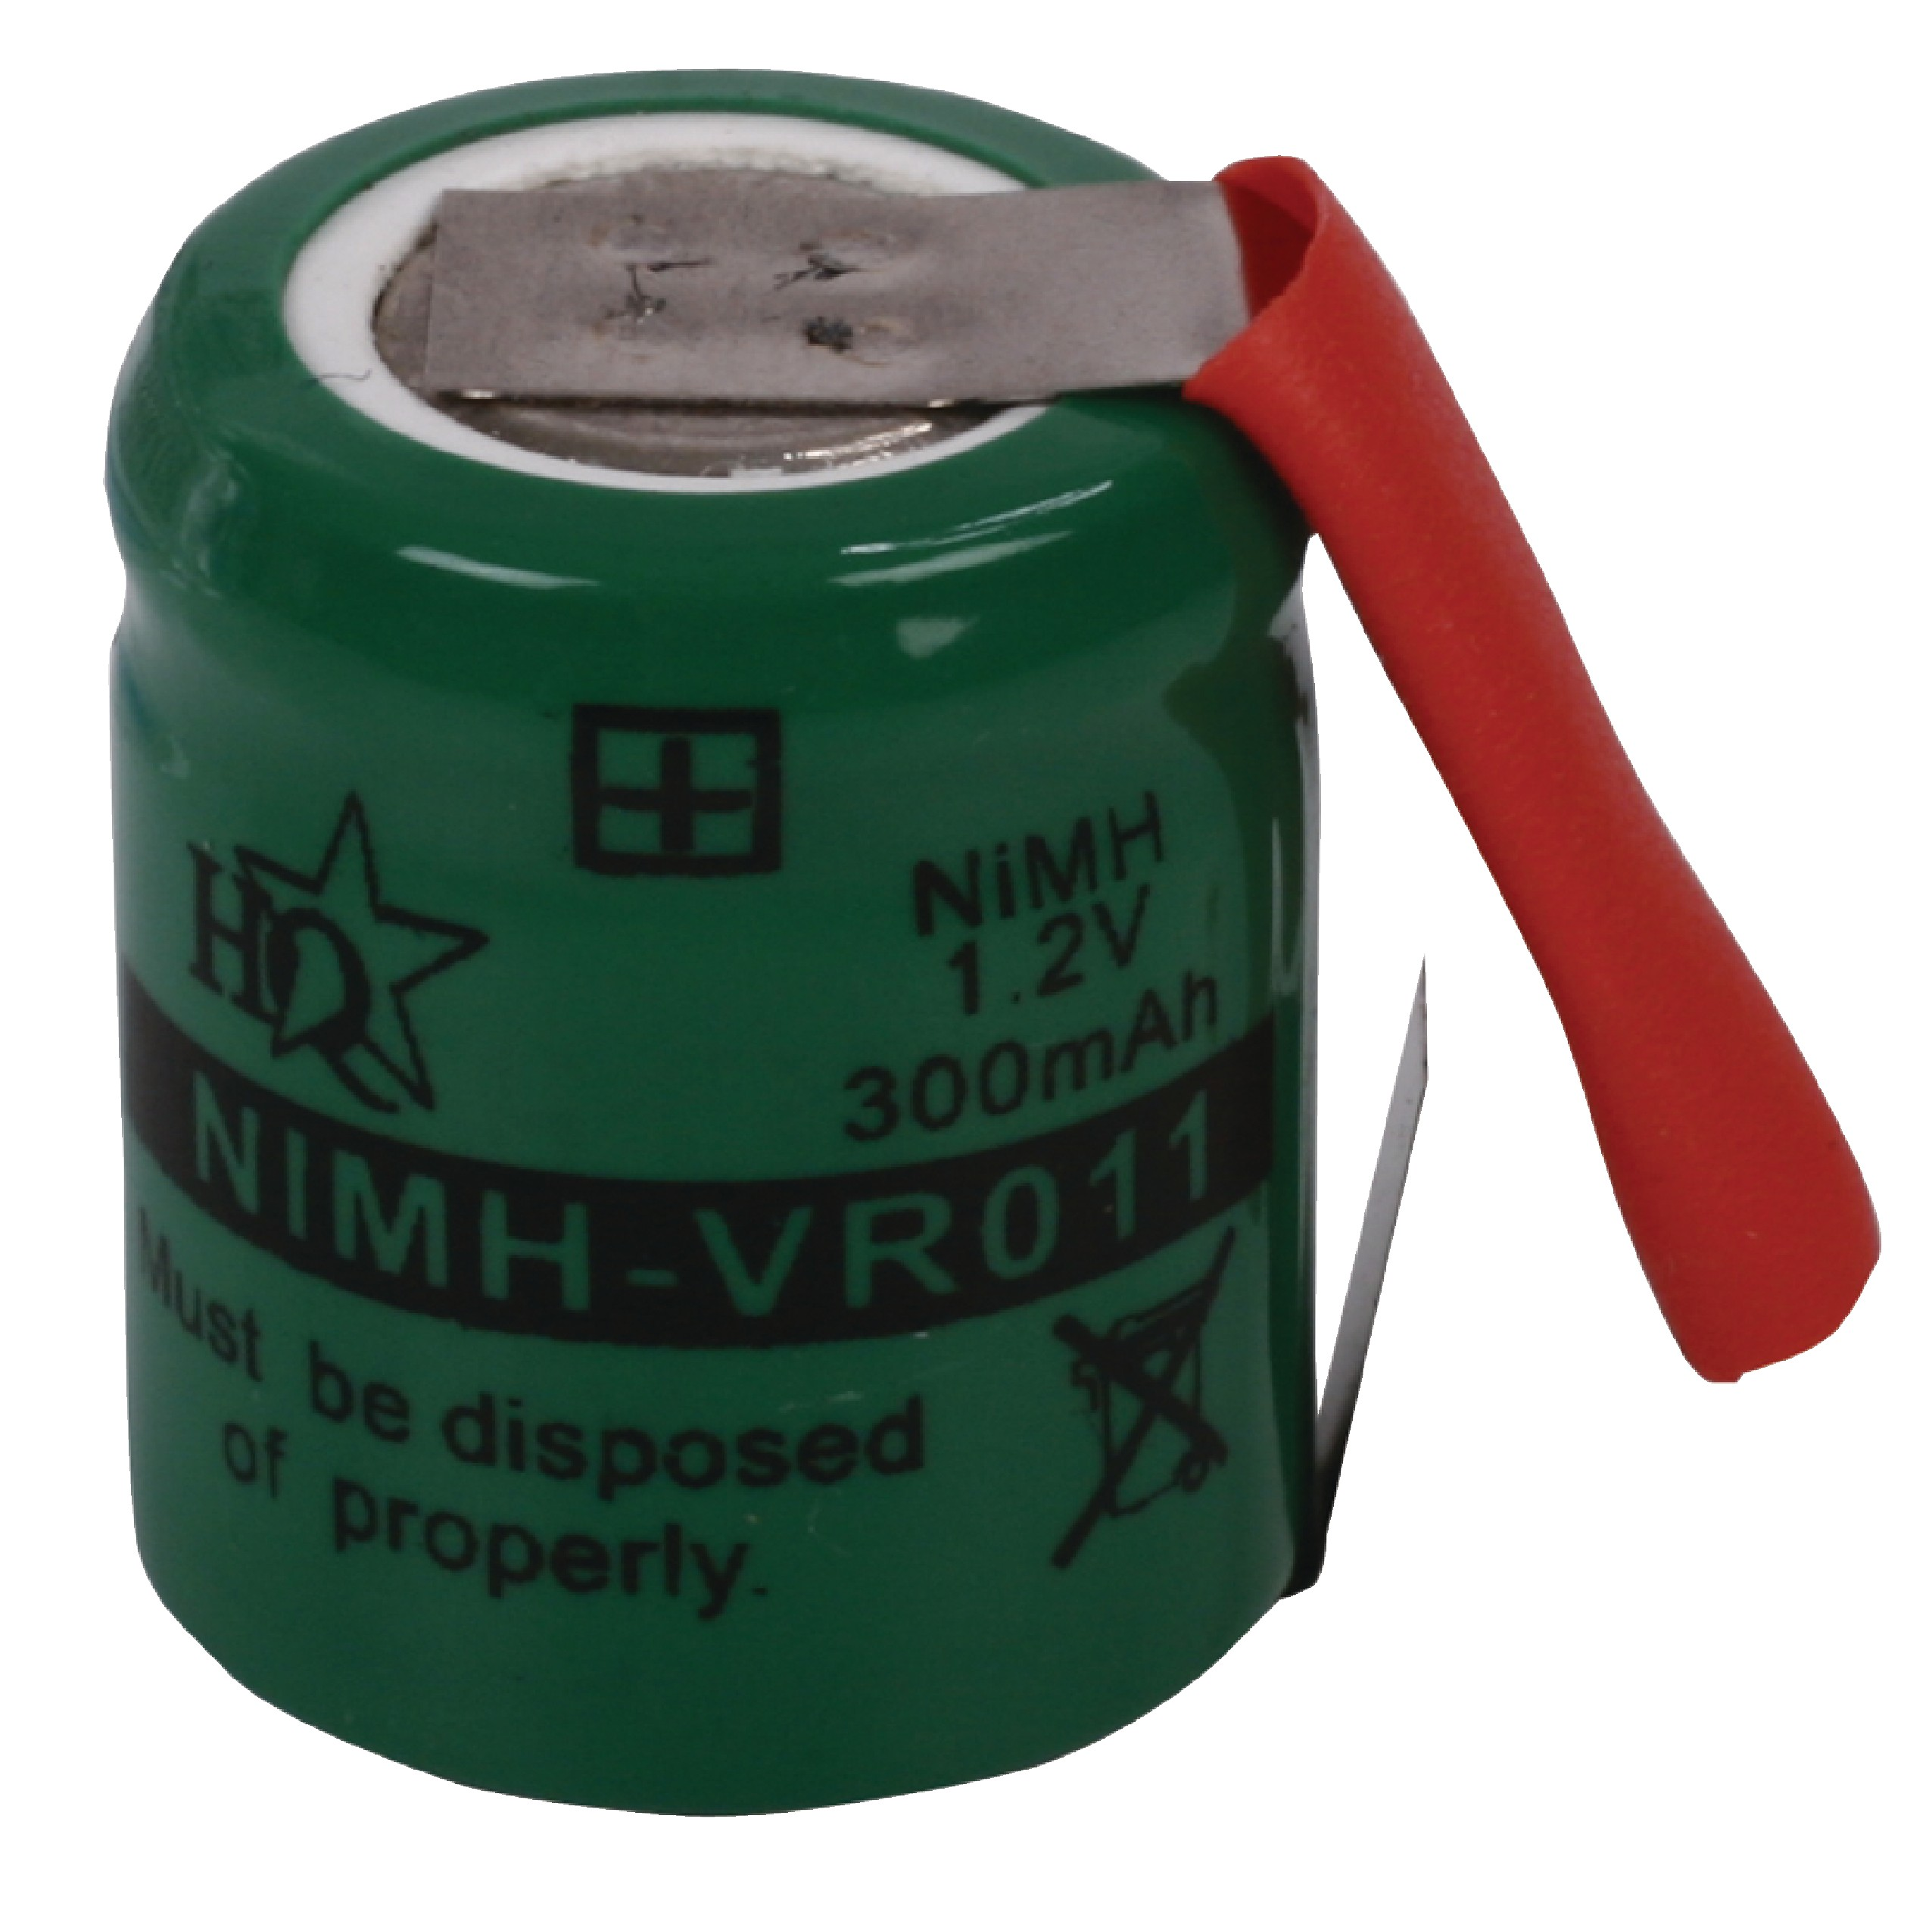 Akumulátor NiMH 1.2V/300mAh, NIMH-VR011